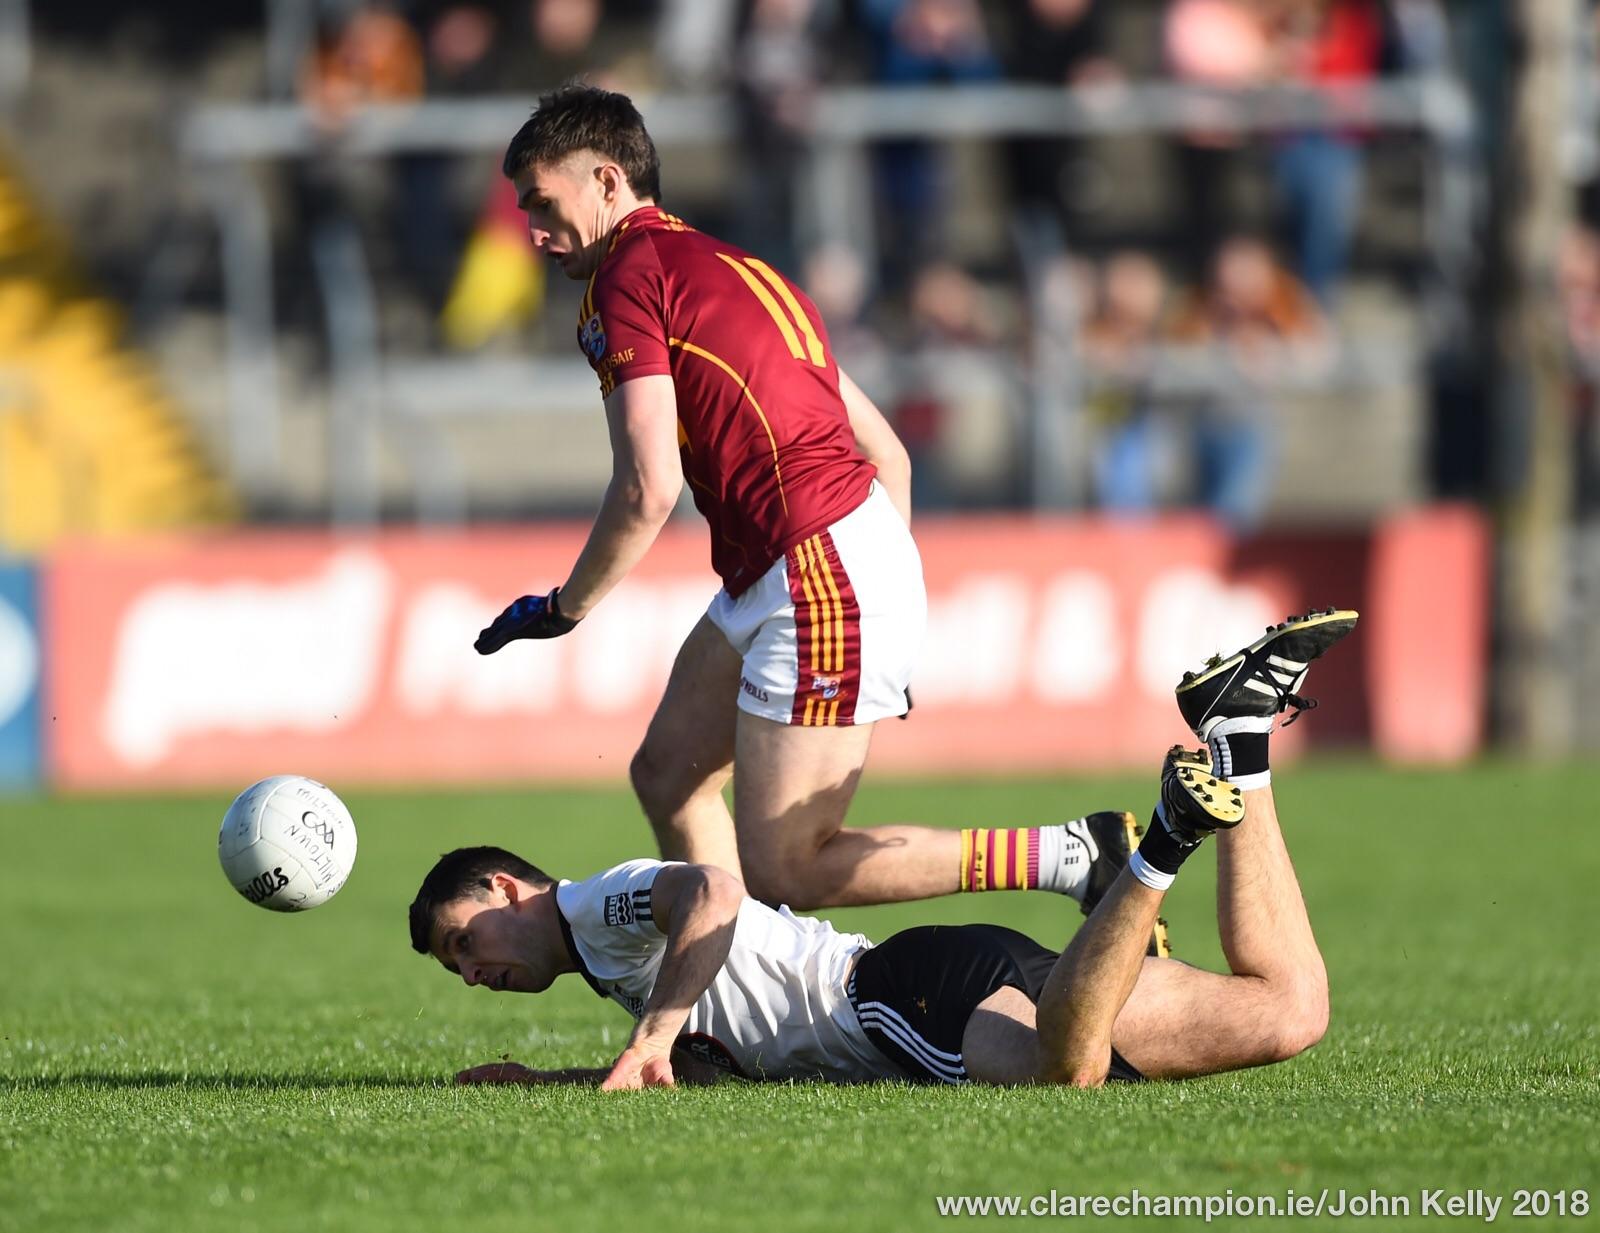 St Joseph's through to Munster Senior Football Final